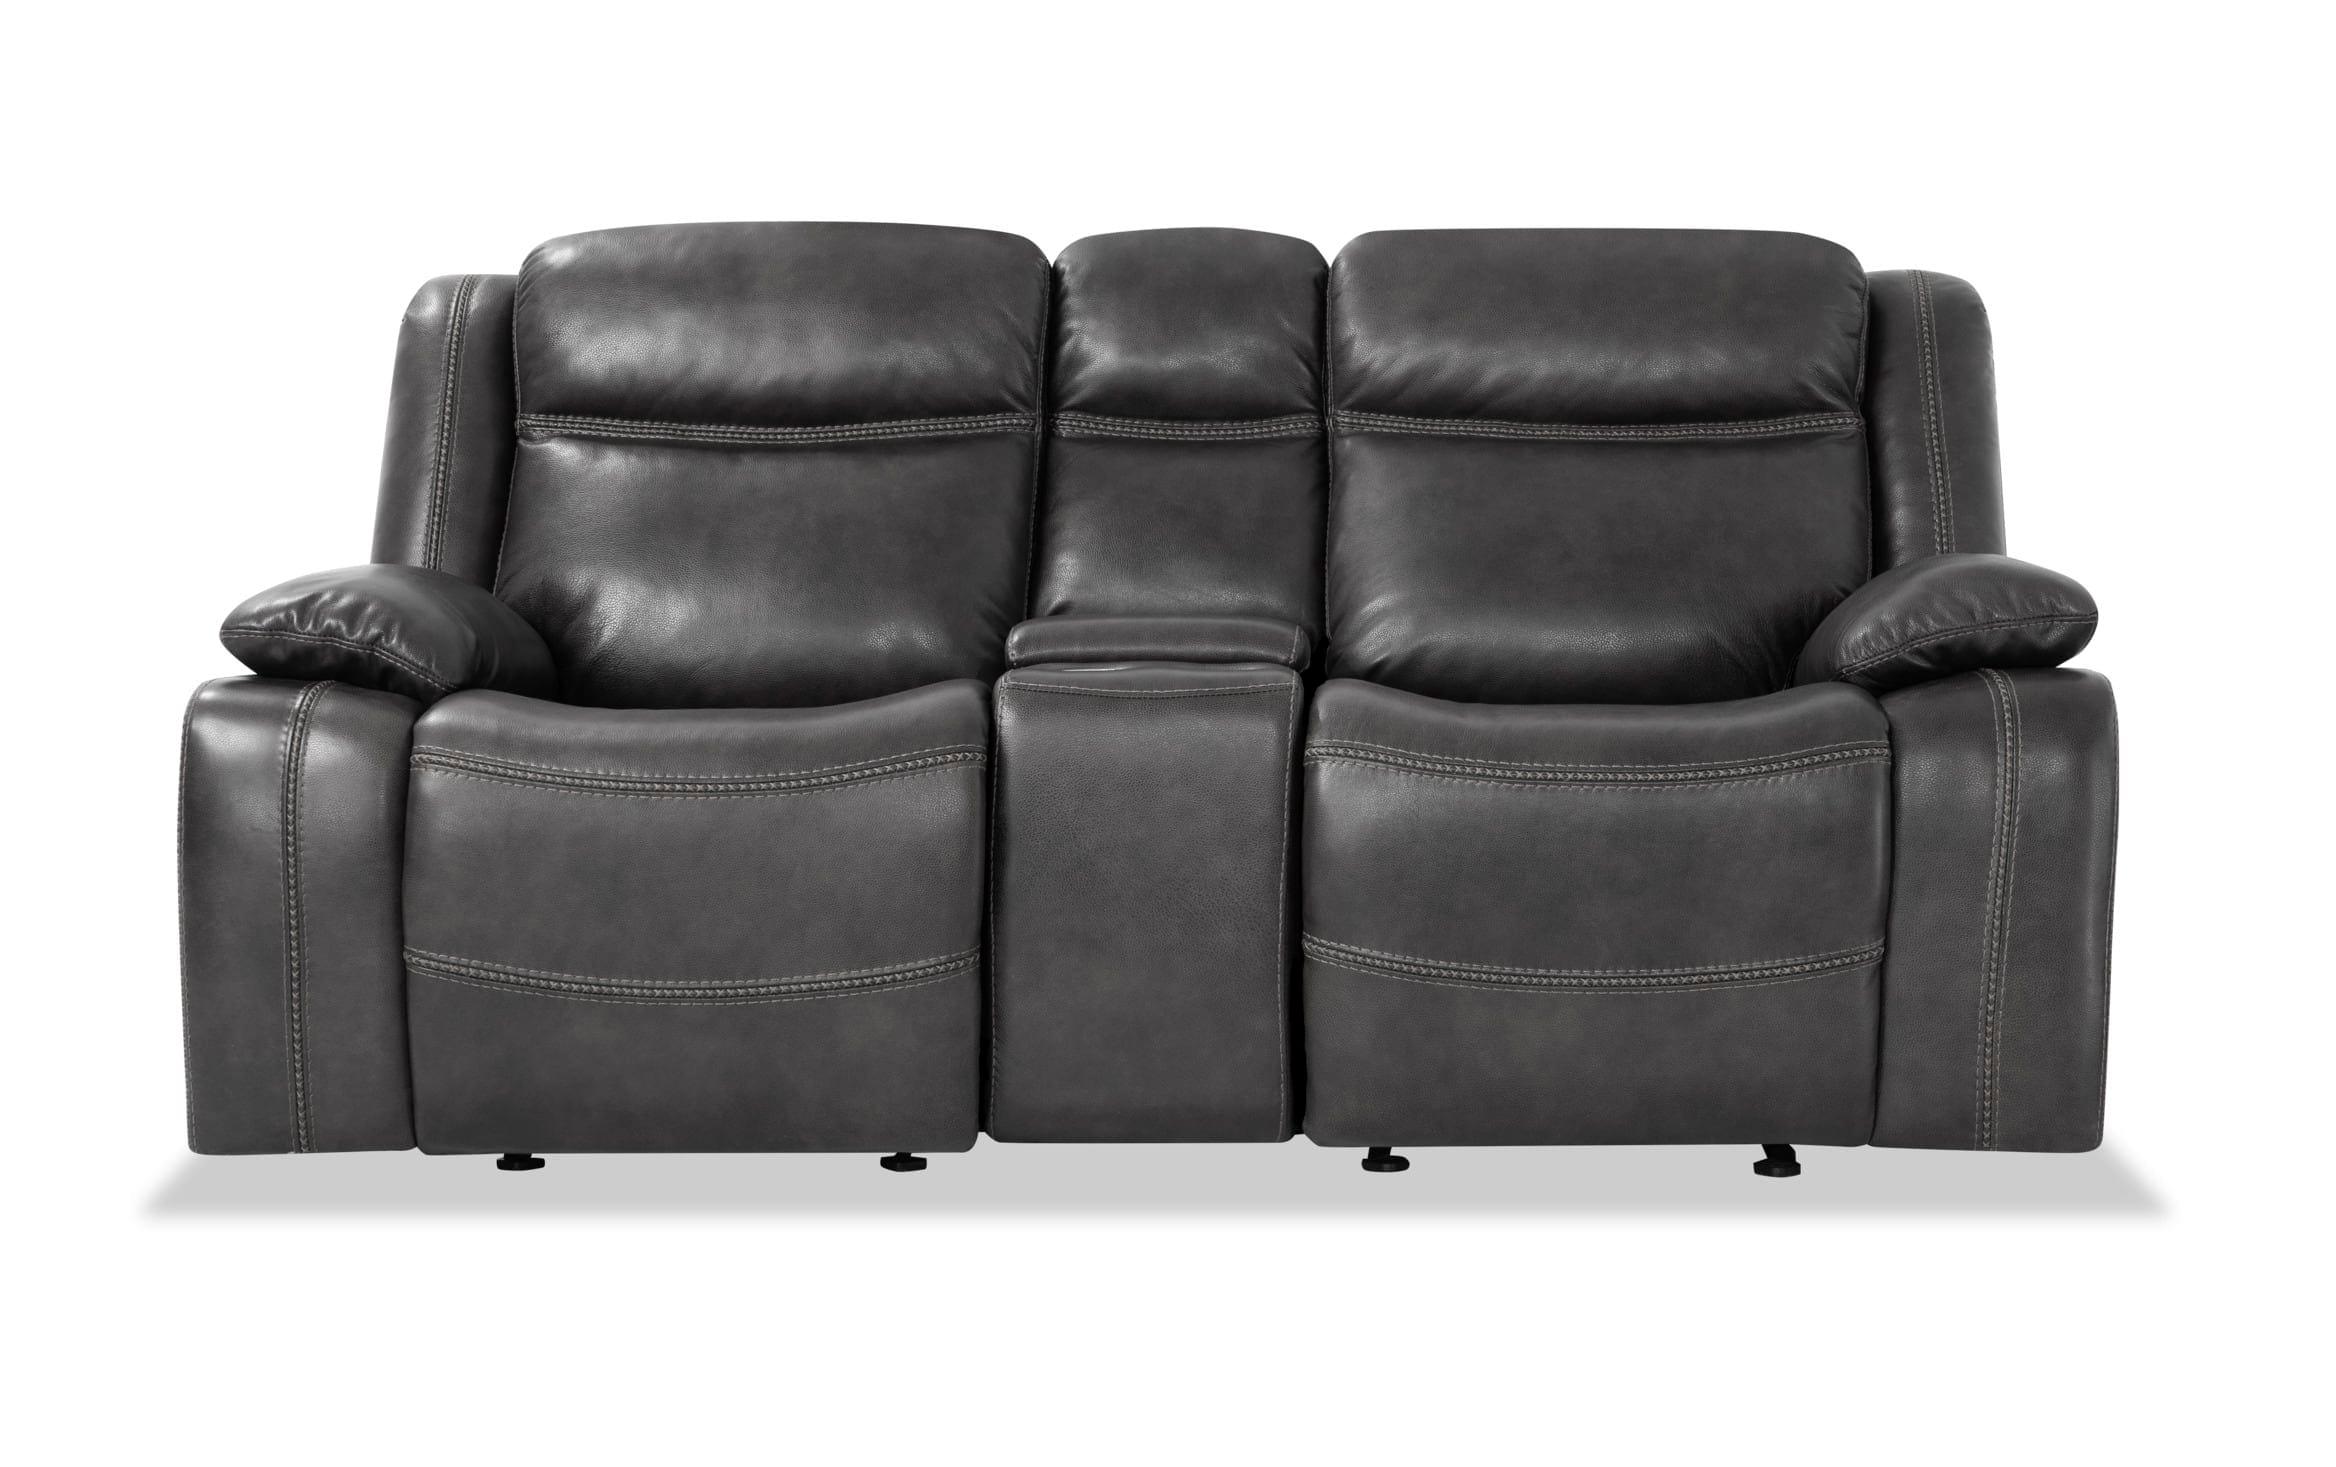 Trailblazer Gray Leather Power Reclining Sofas With Trendy Olympus Gray Leather Power Reclining Loveseat Bob S (View 1 of 15)